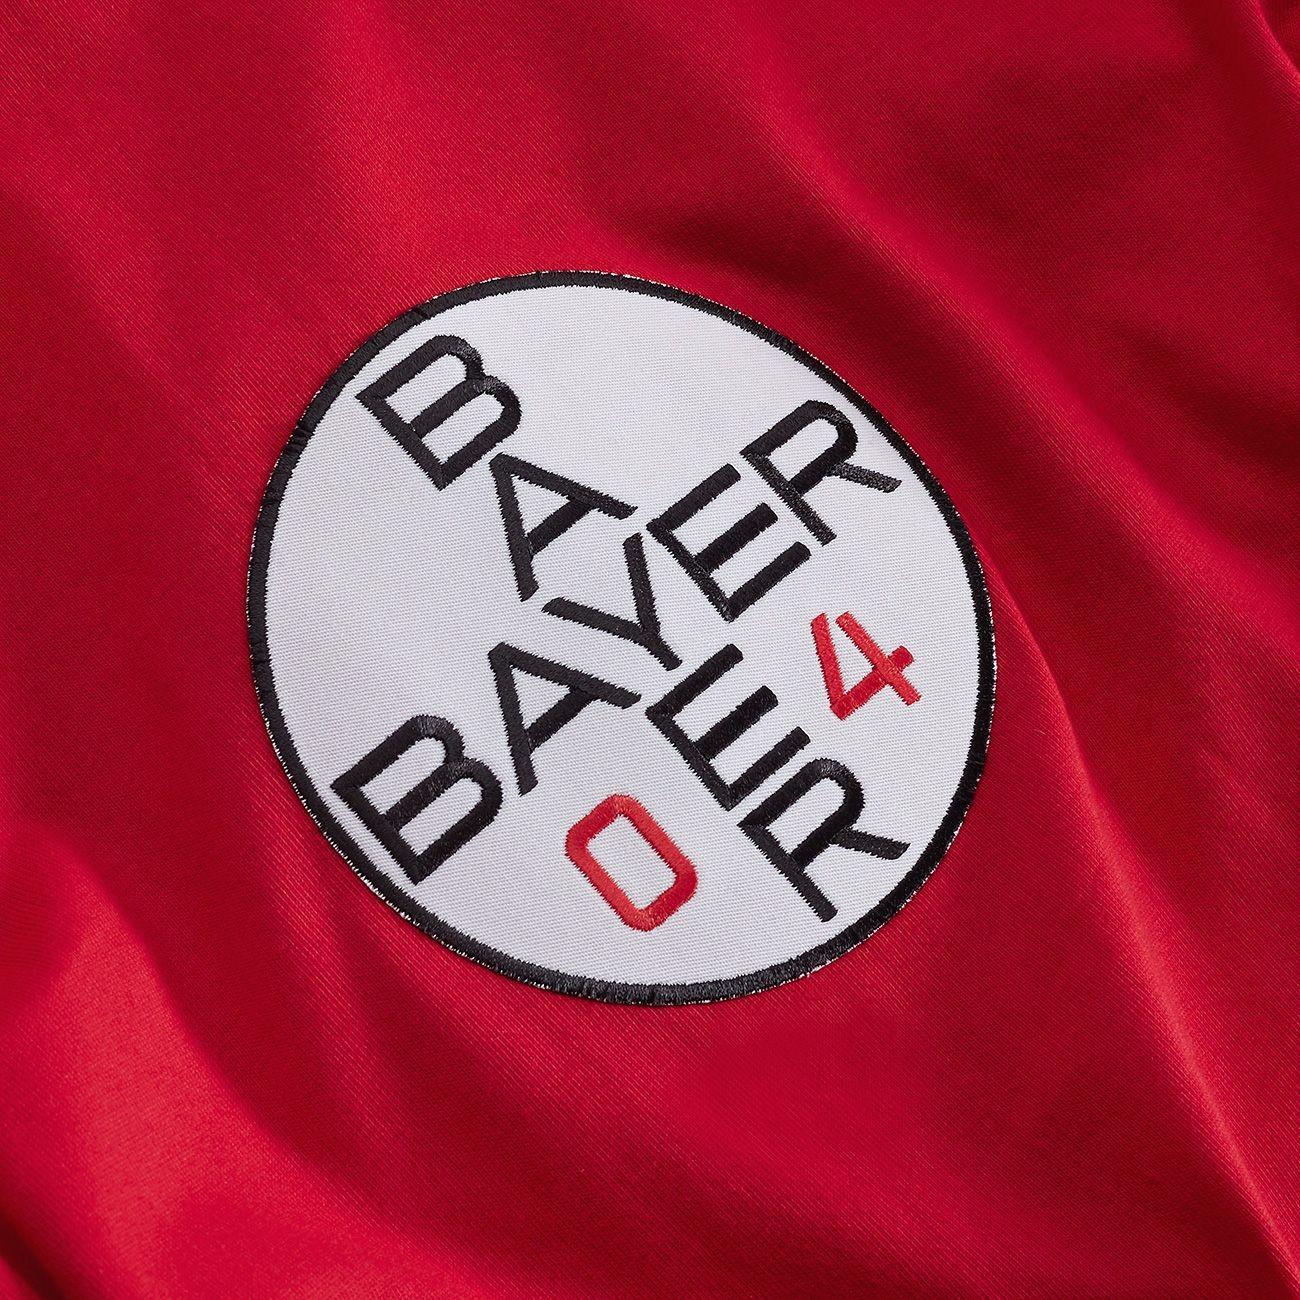 felpa calcio Bayer 04 Leverkusen ufficiale